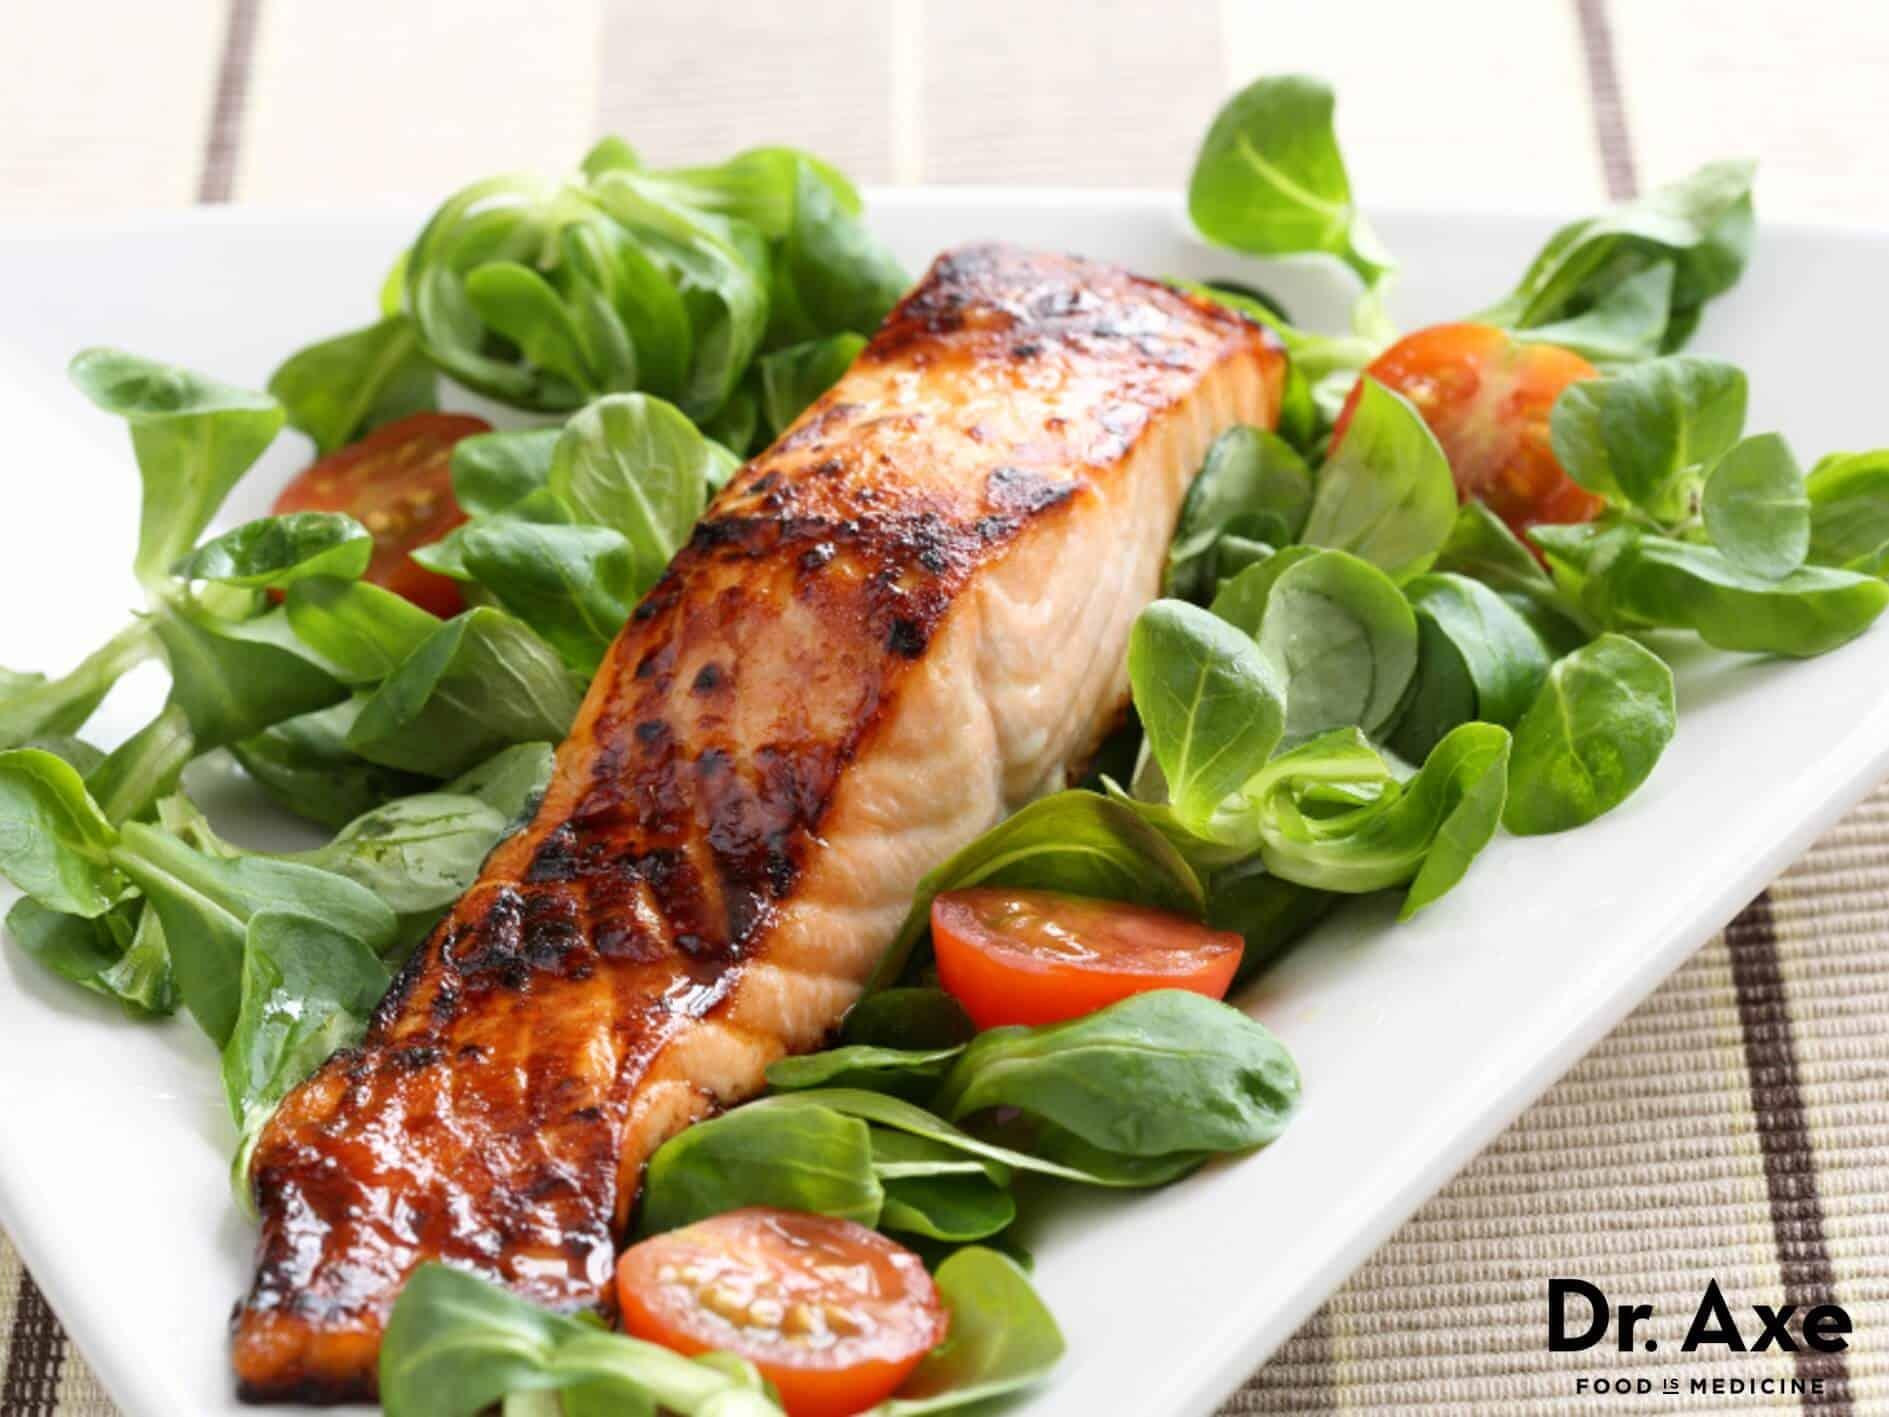 Grilled honey glazed salmon recipe - Dr. Axe